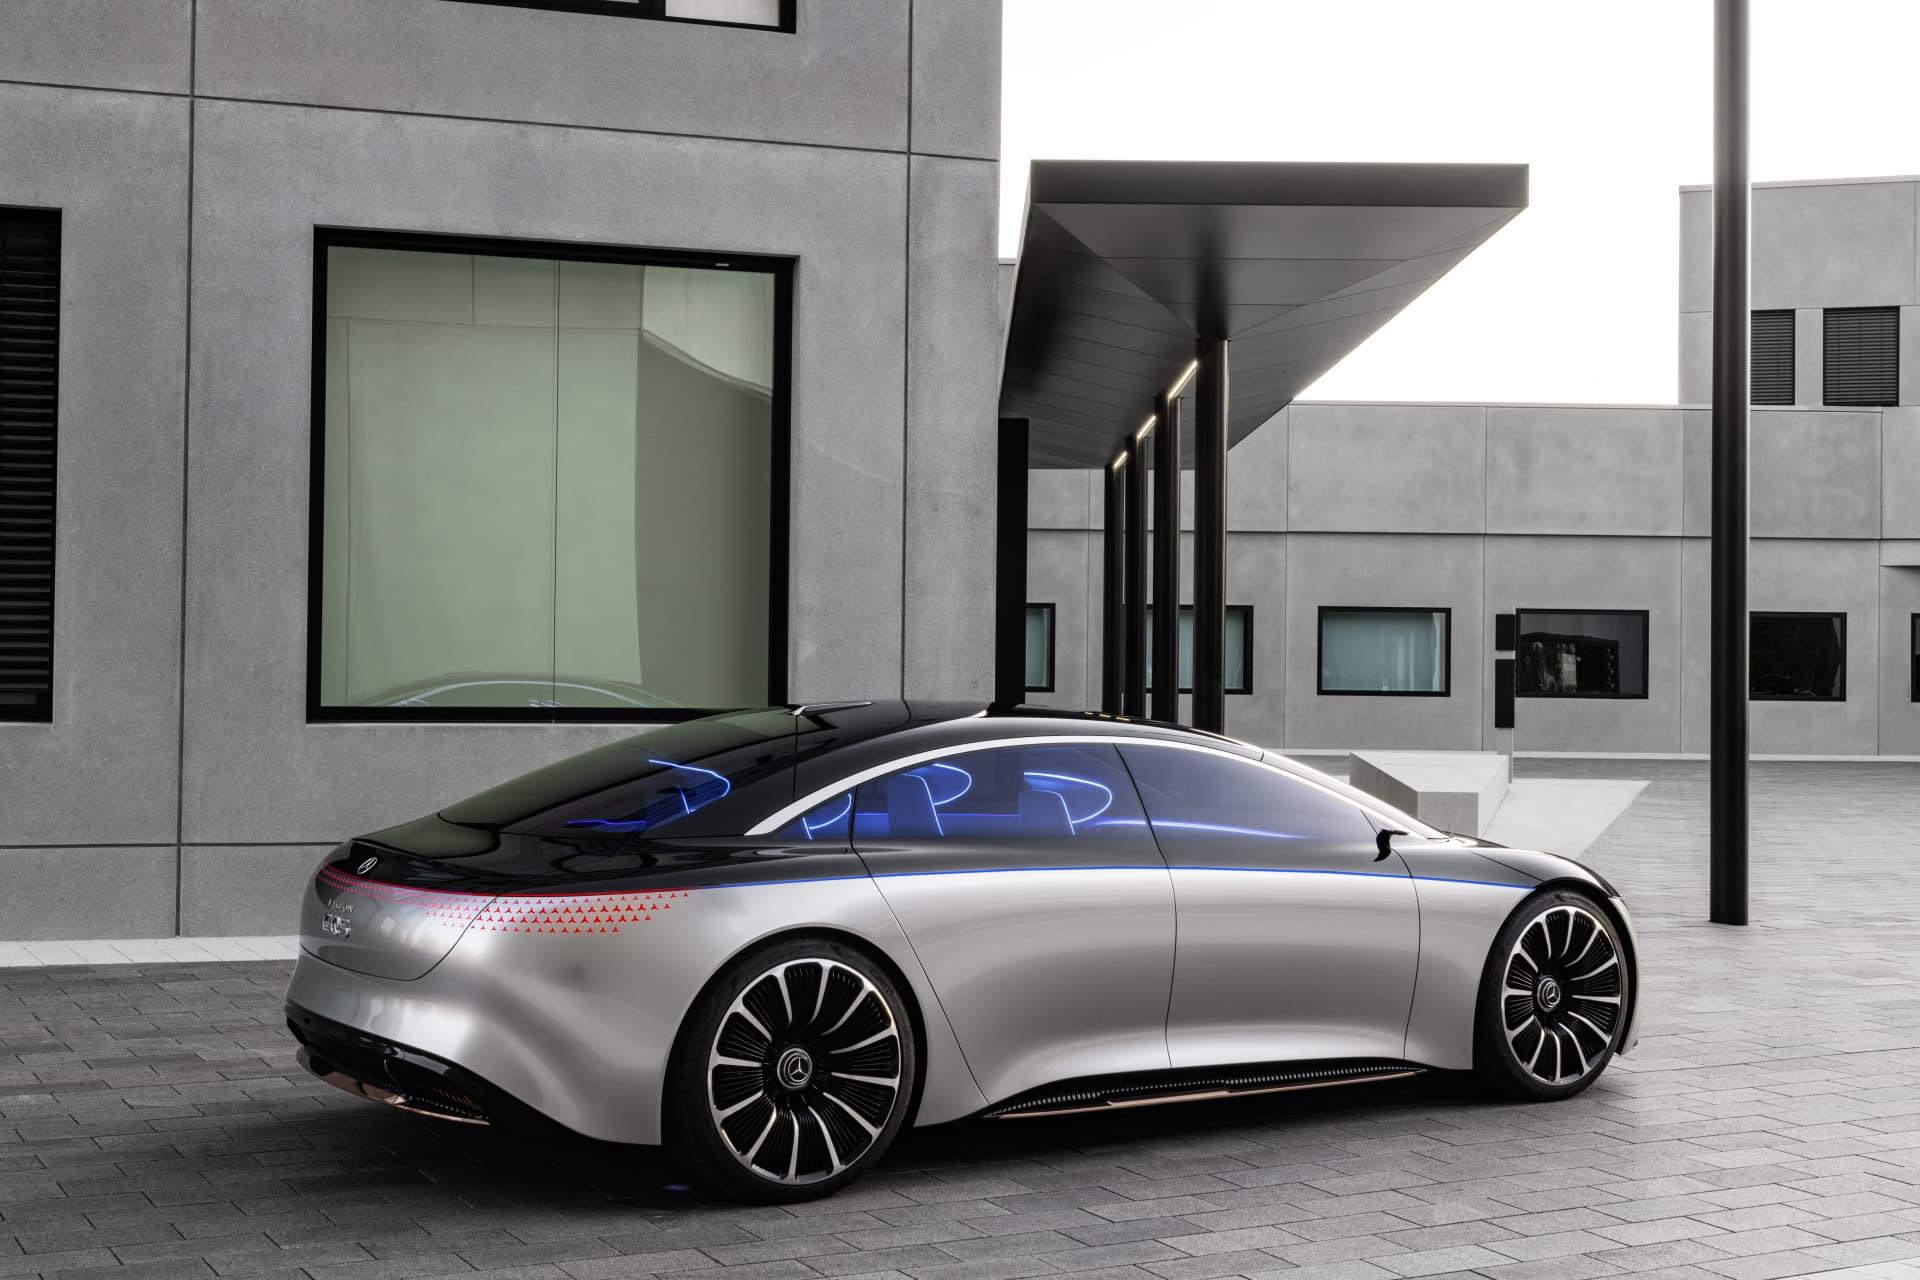 Mercedes Benz Vision Eqs 2019 Mercedes Benz Vision Eqs 2019